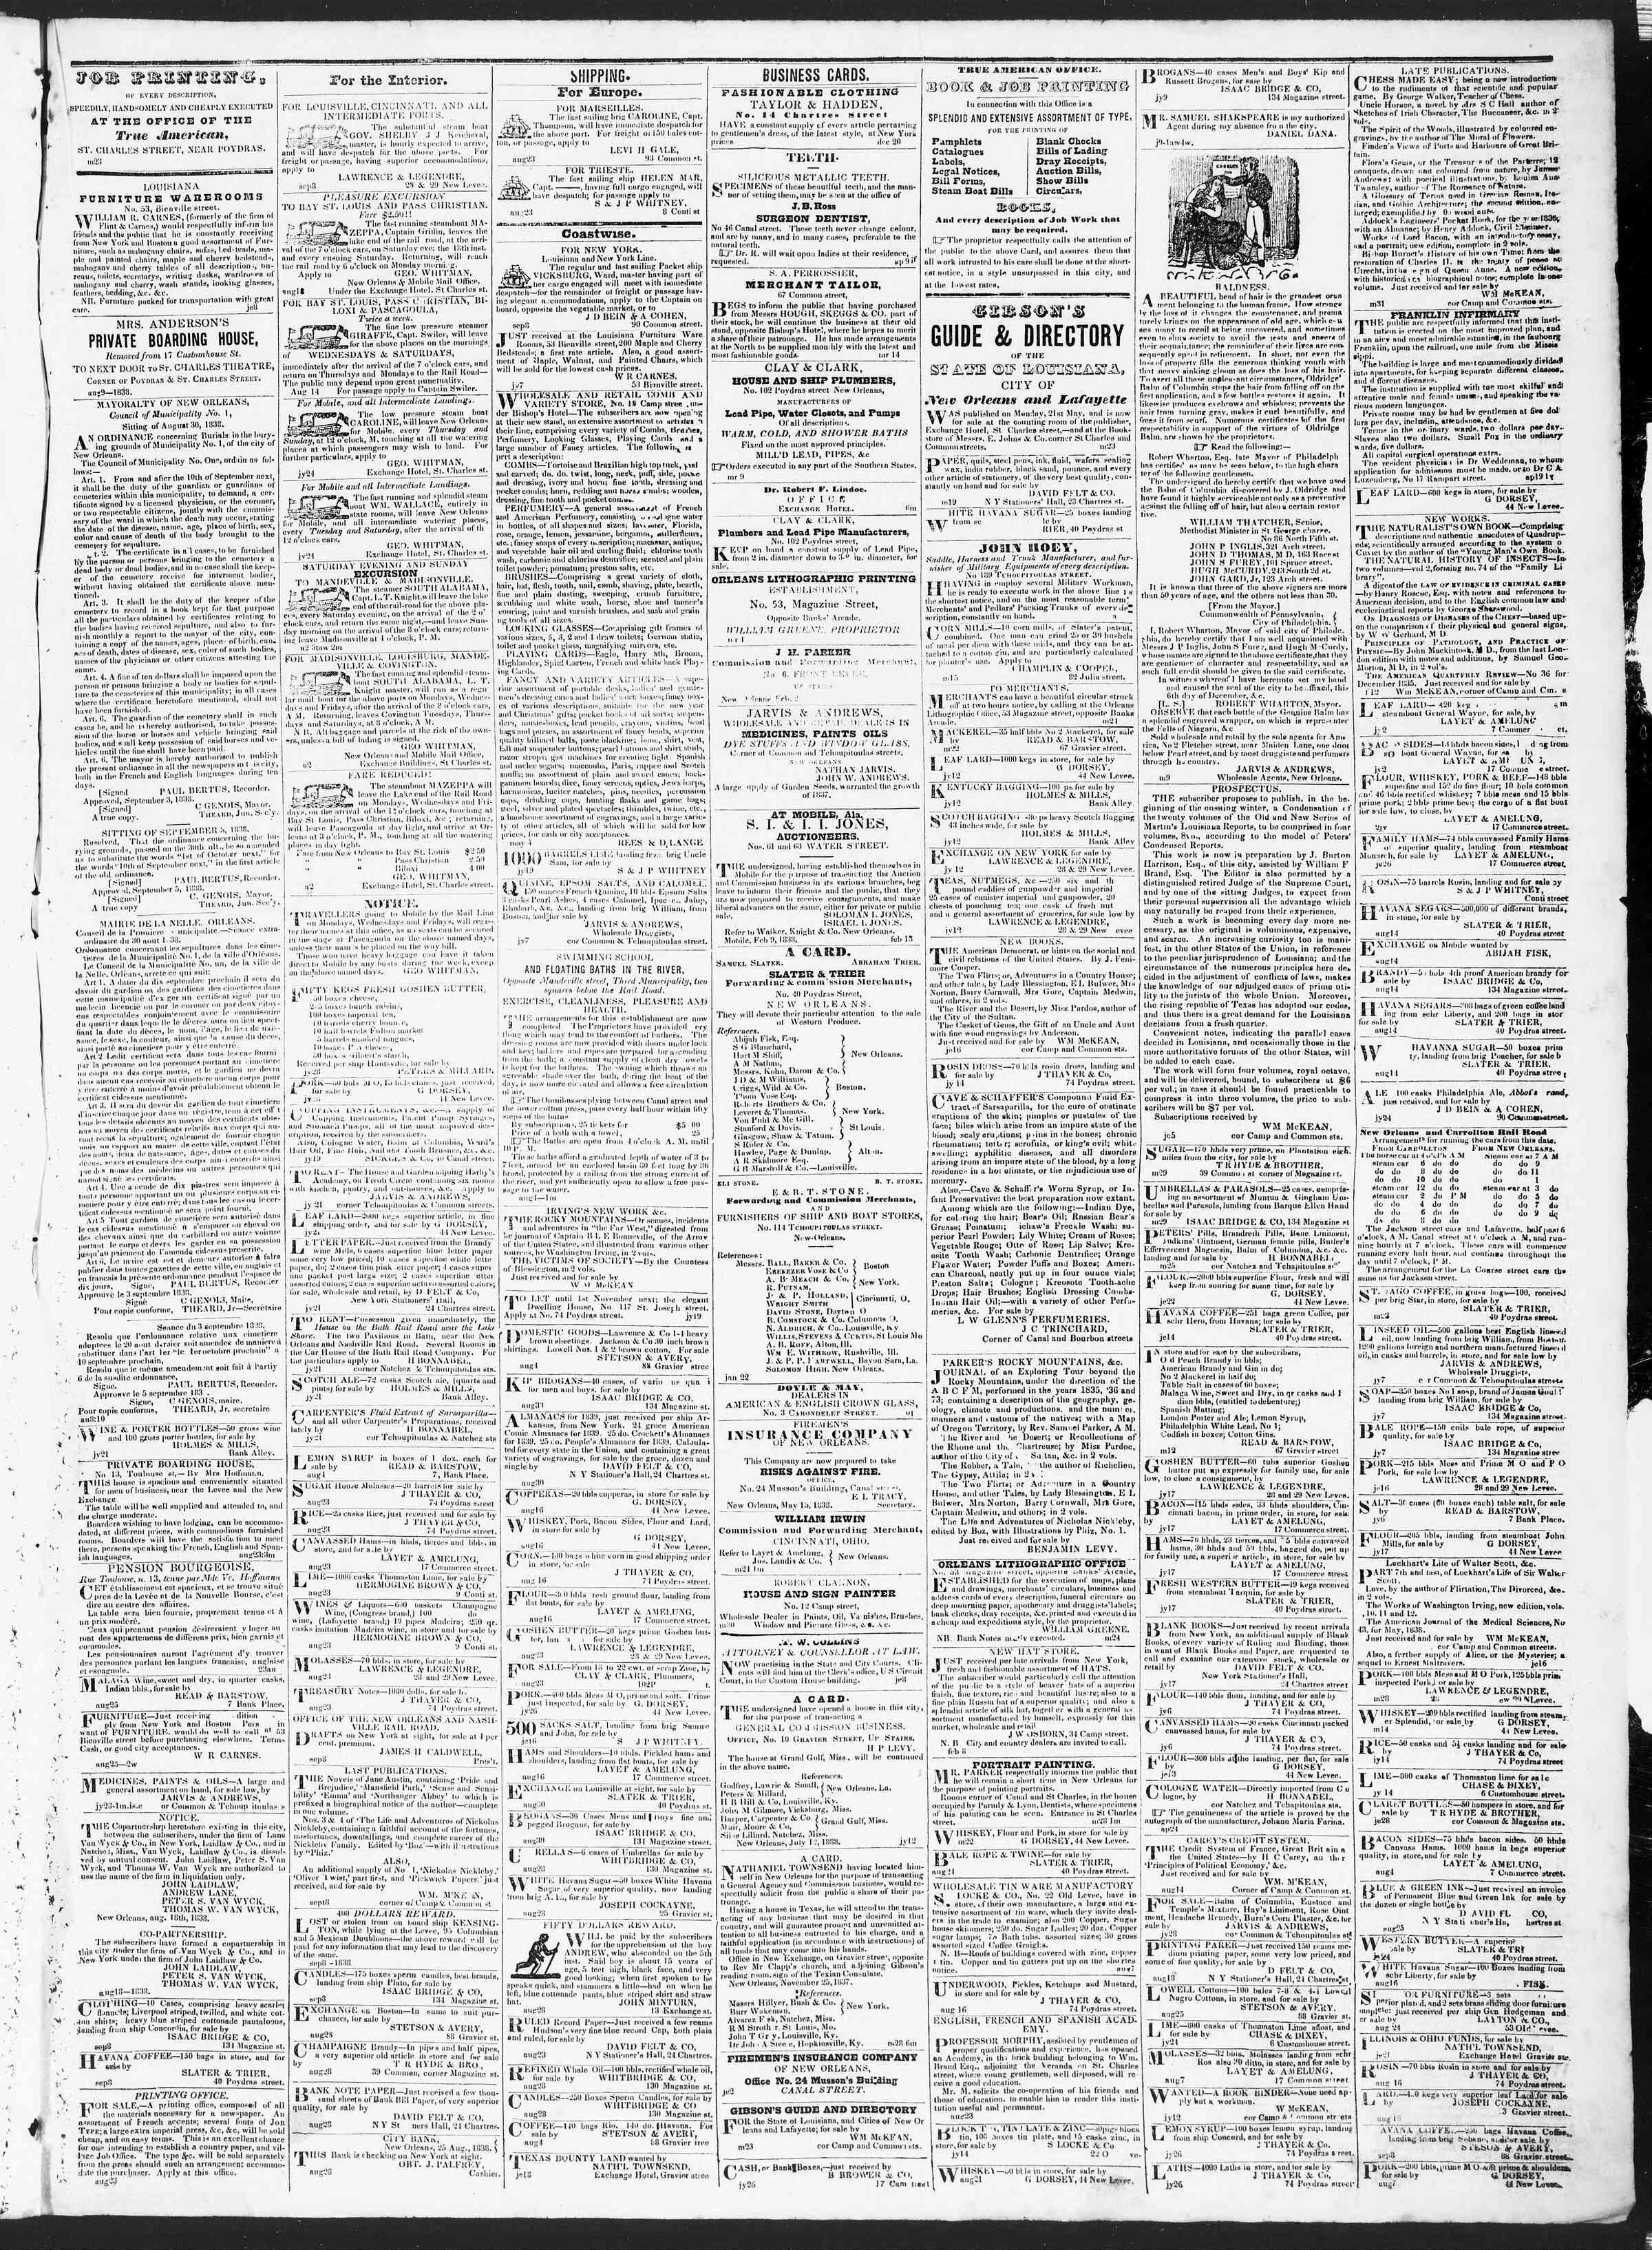 September 13, 1838 Tarihli True American Gazetesi Sayfa 3